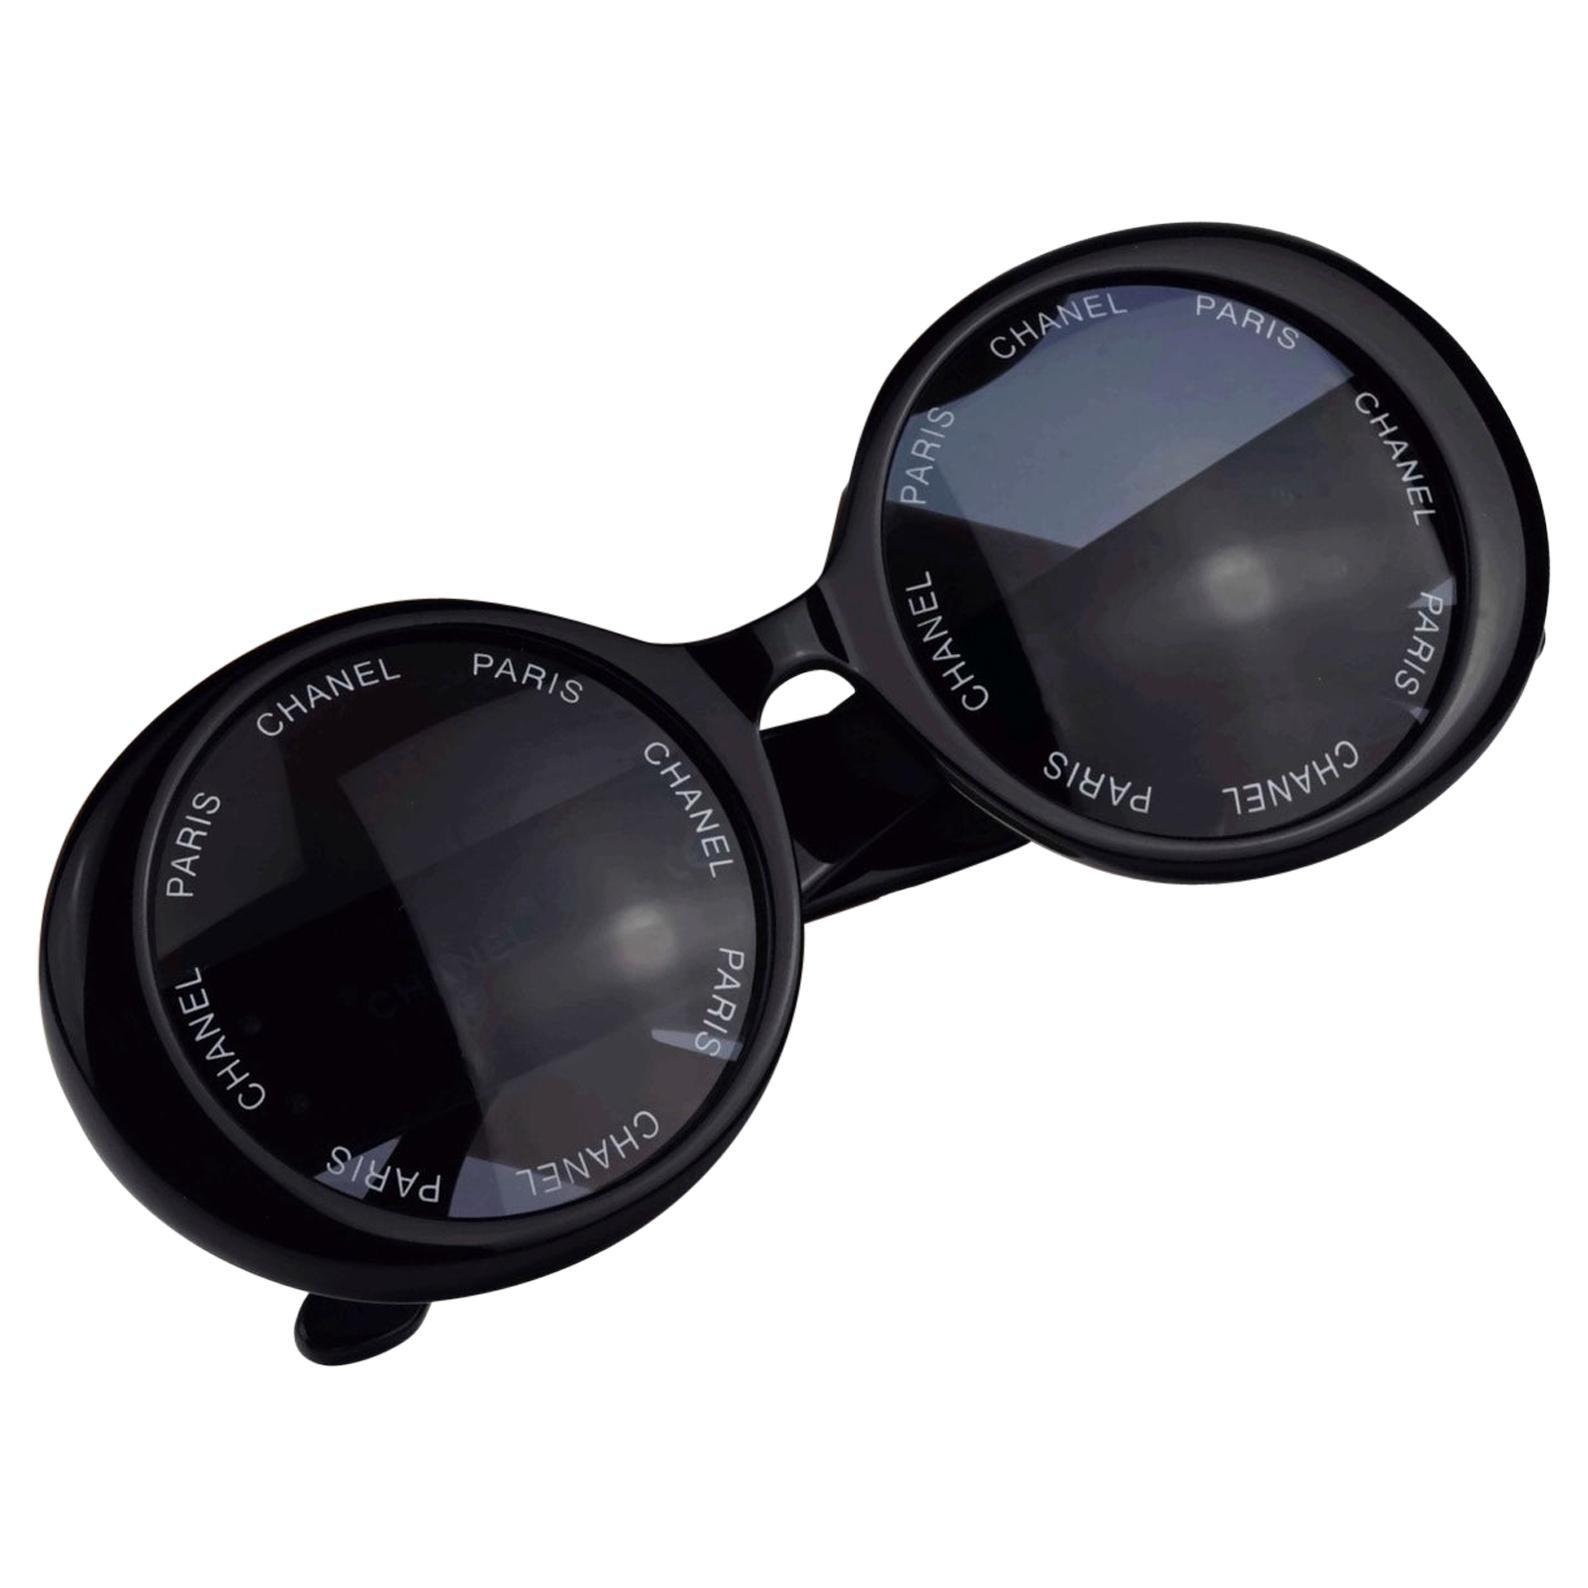 Vintage 1993 Iconic CHANEL PARIS Lens Round Black Sunglasses As Seen On Rihana